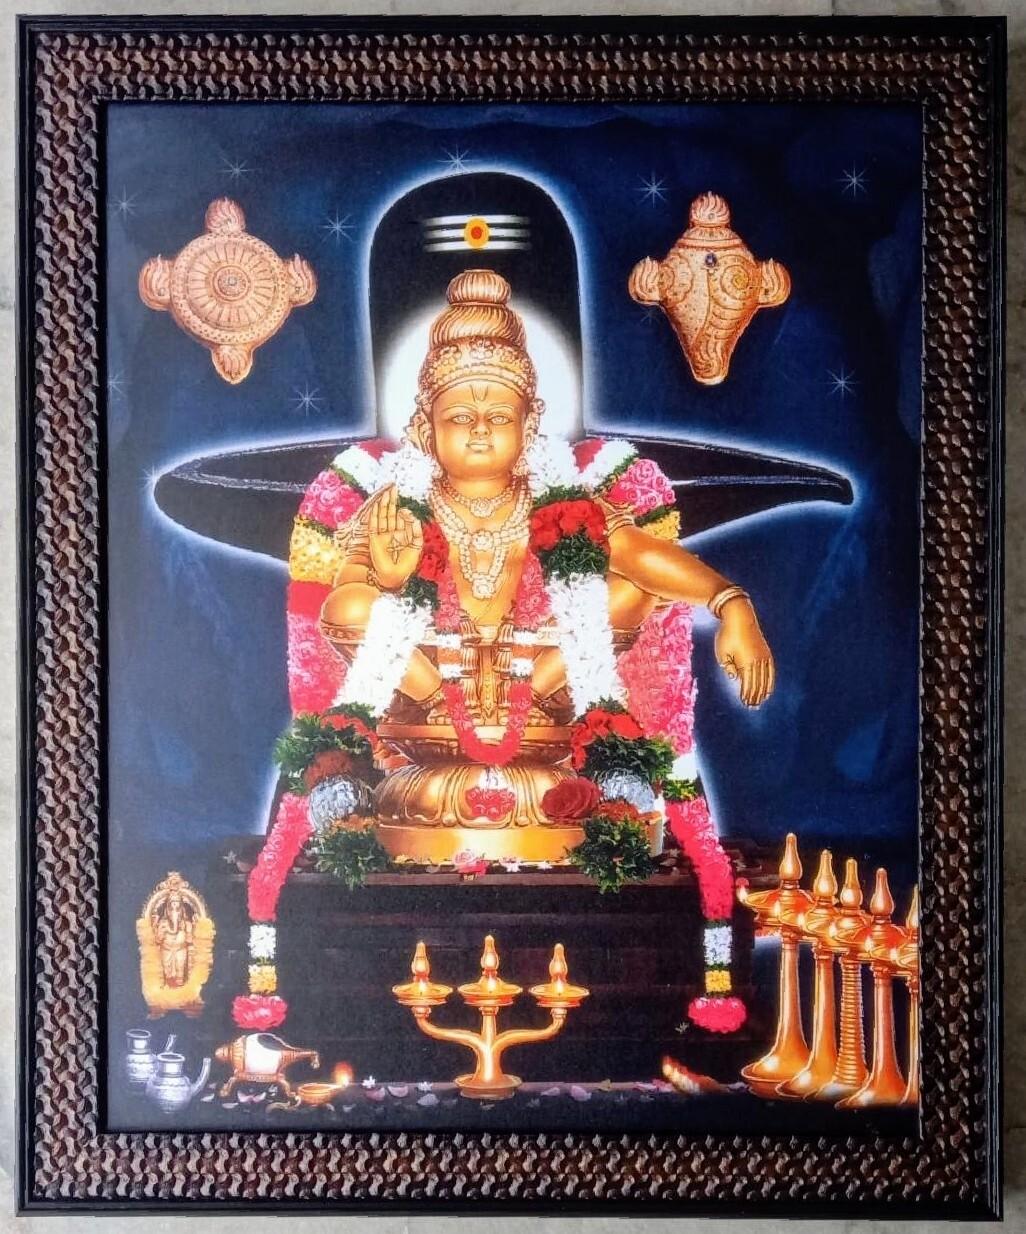 Lord Ayyappan Swamy Photo Frame